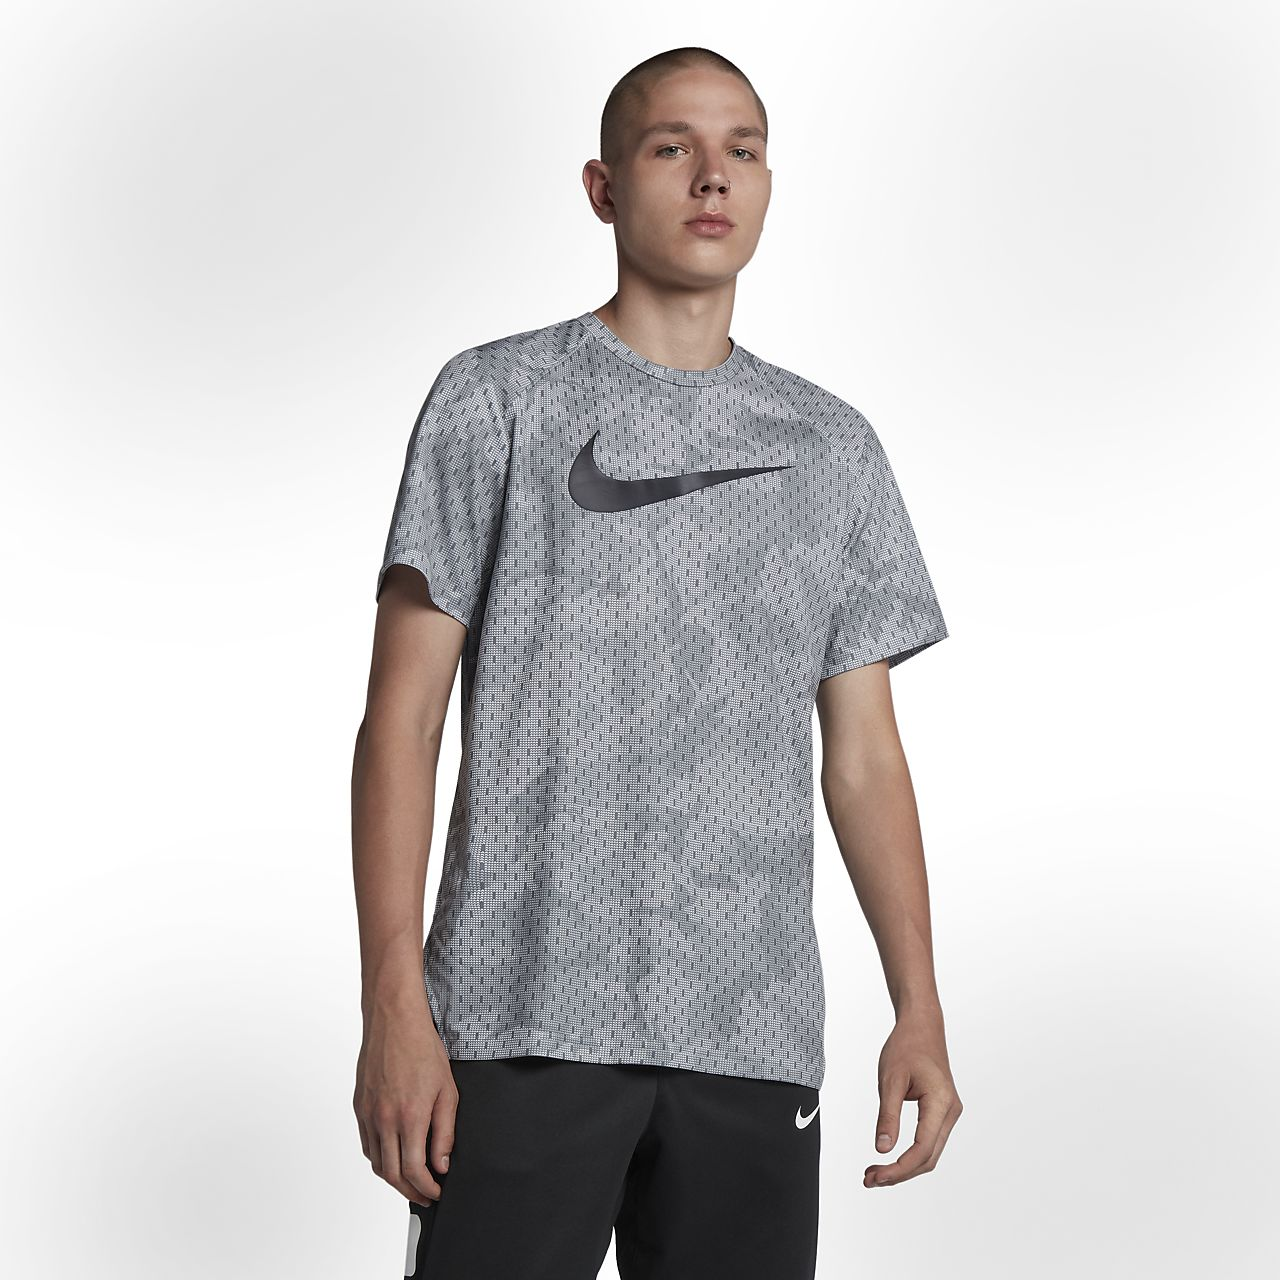 06ecb804cd71 Nike Dri-FIT Elite Men s Short-Sleeve Basketball Top. Nike.com GB